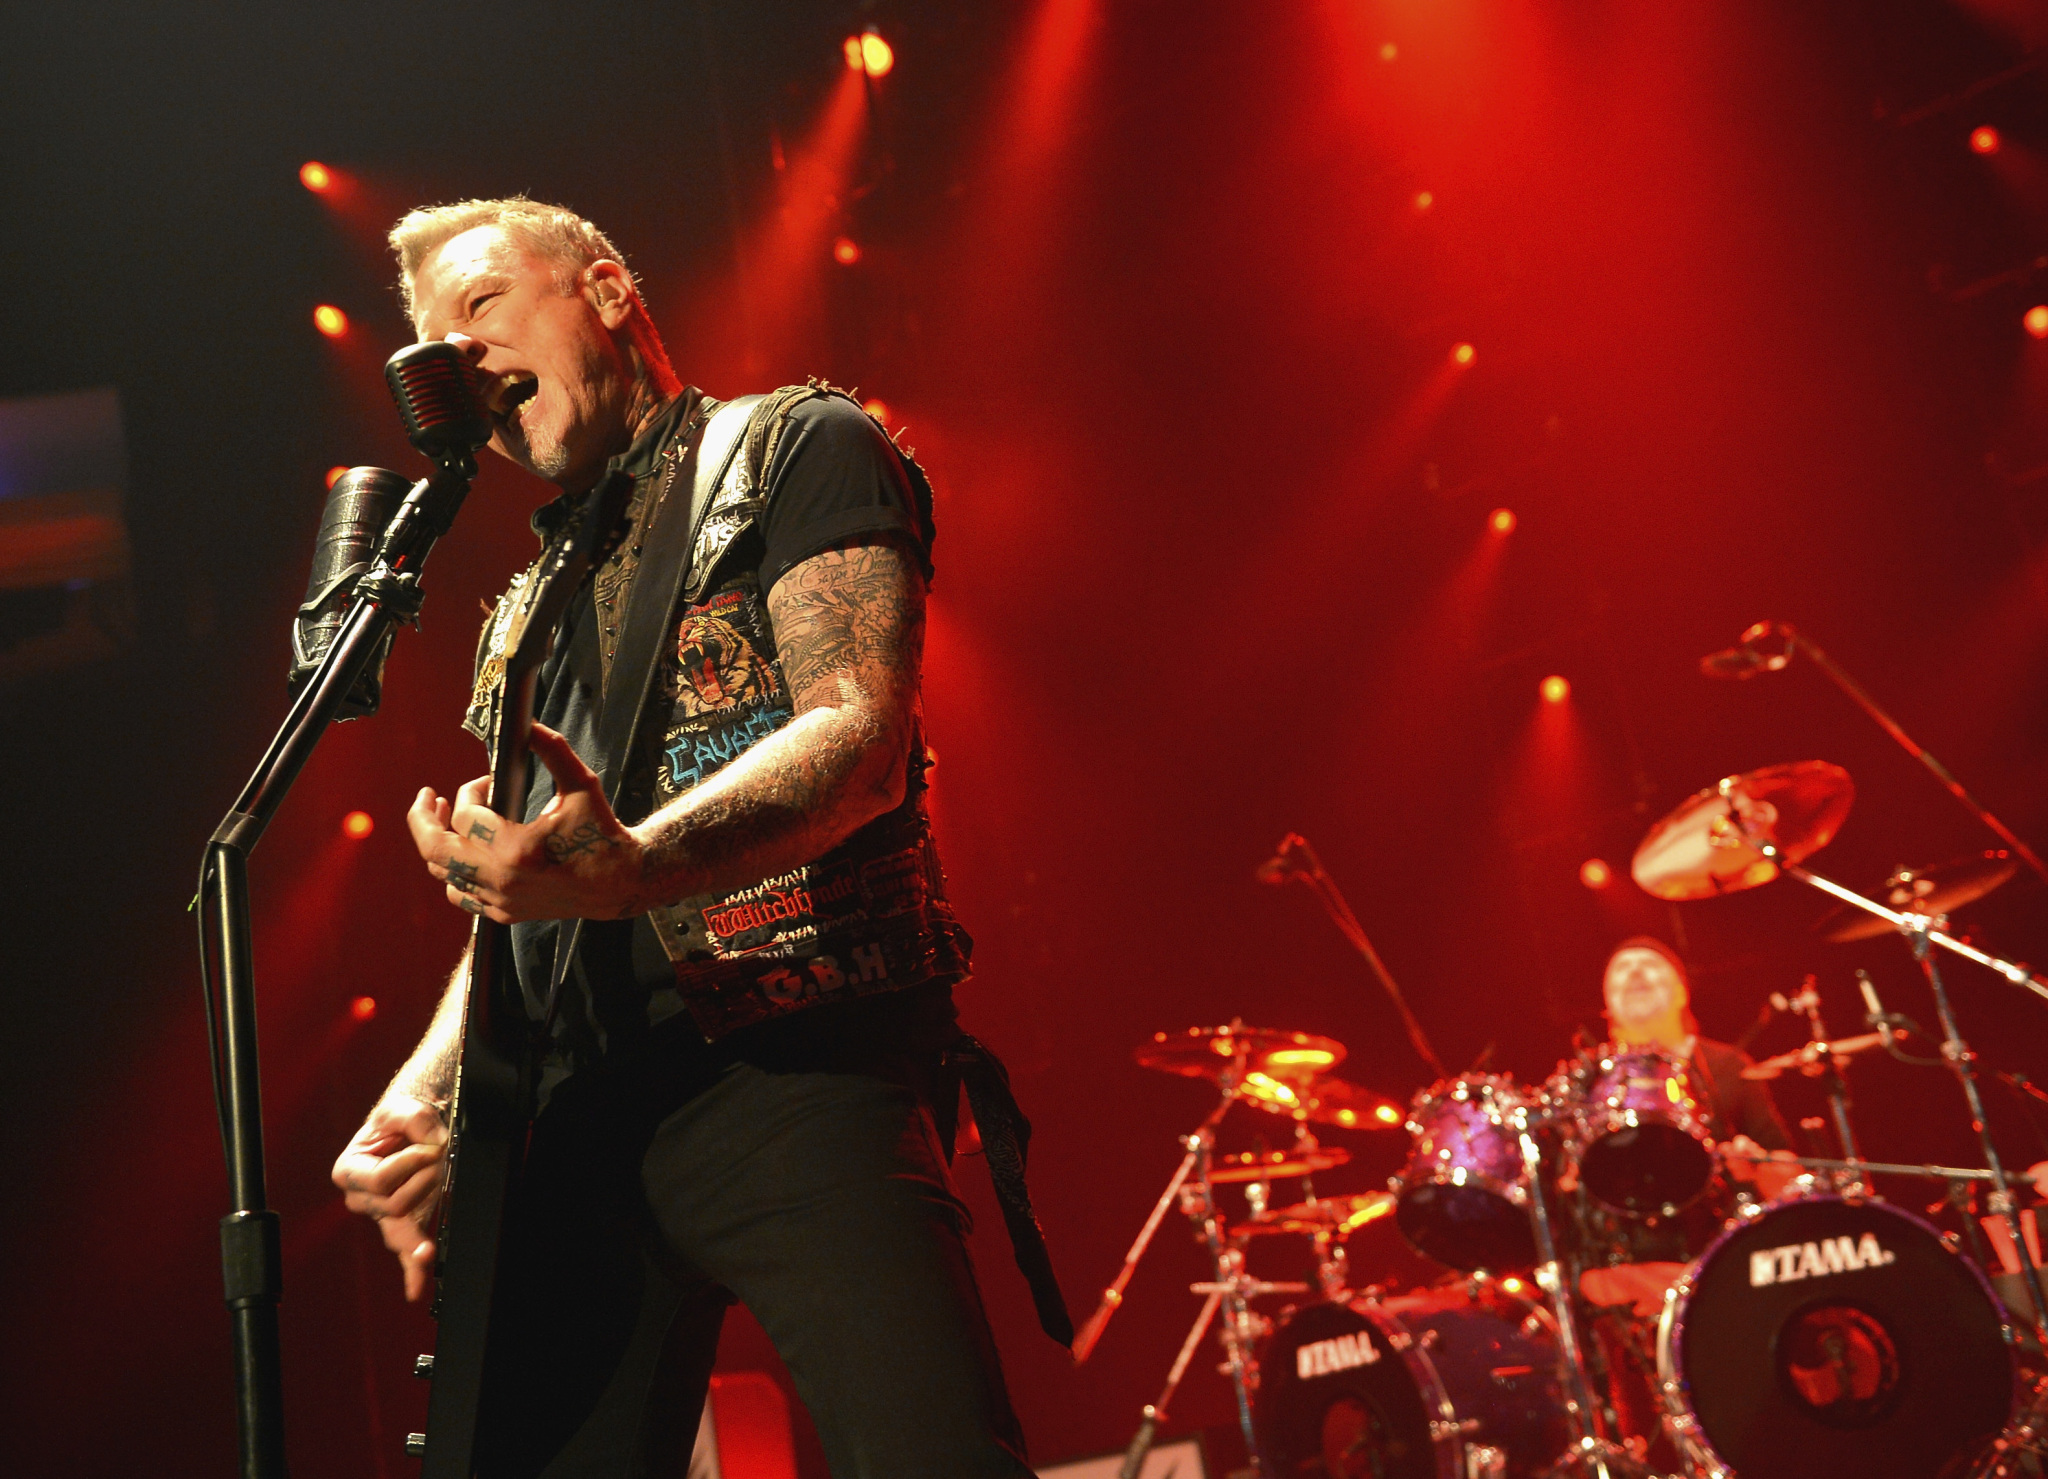 New Metallica is coming